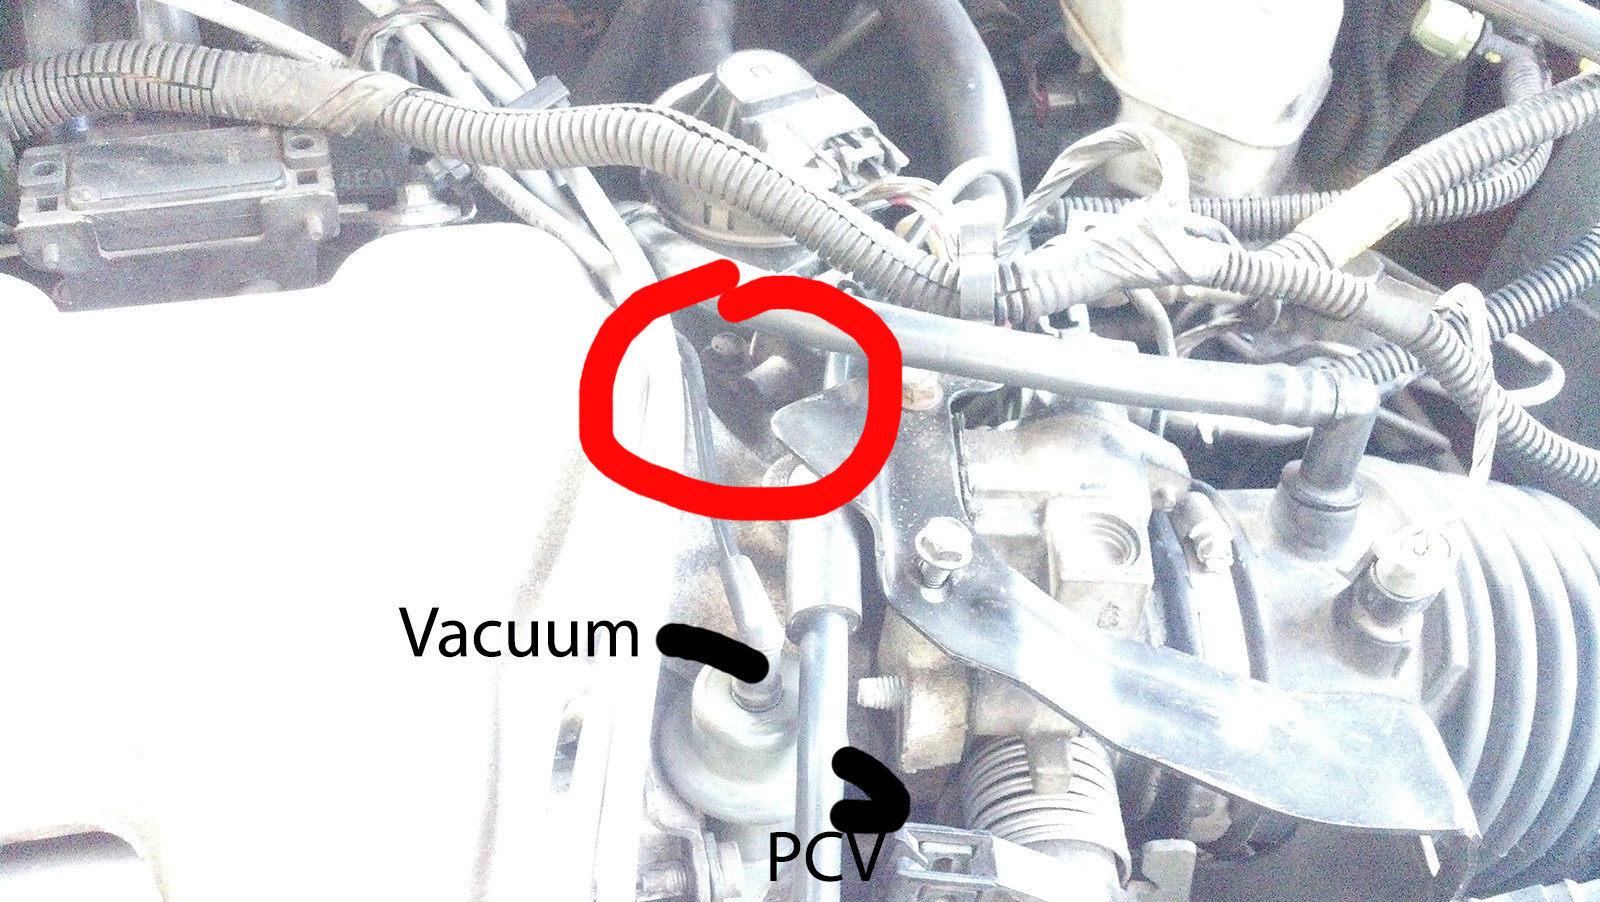 toyota rav4 exhaust system diagram honeywell zone valves wiring 3 5l engine valve train